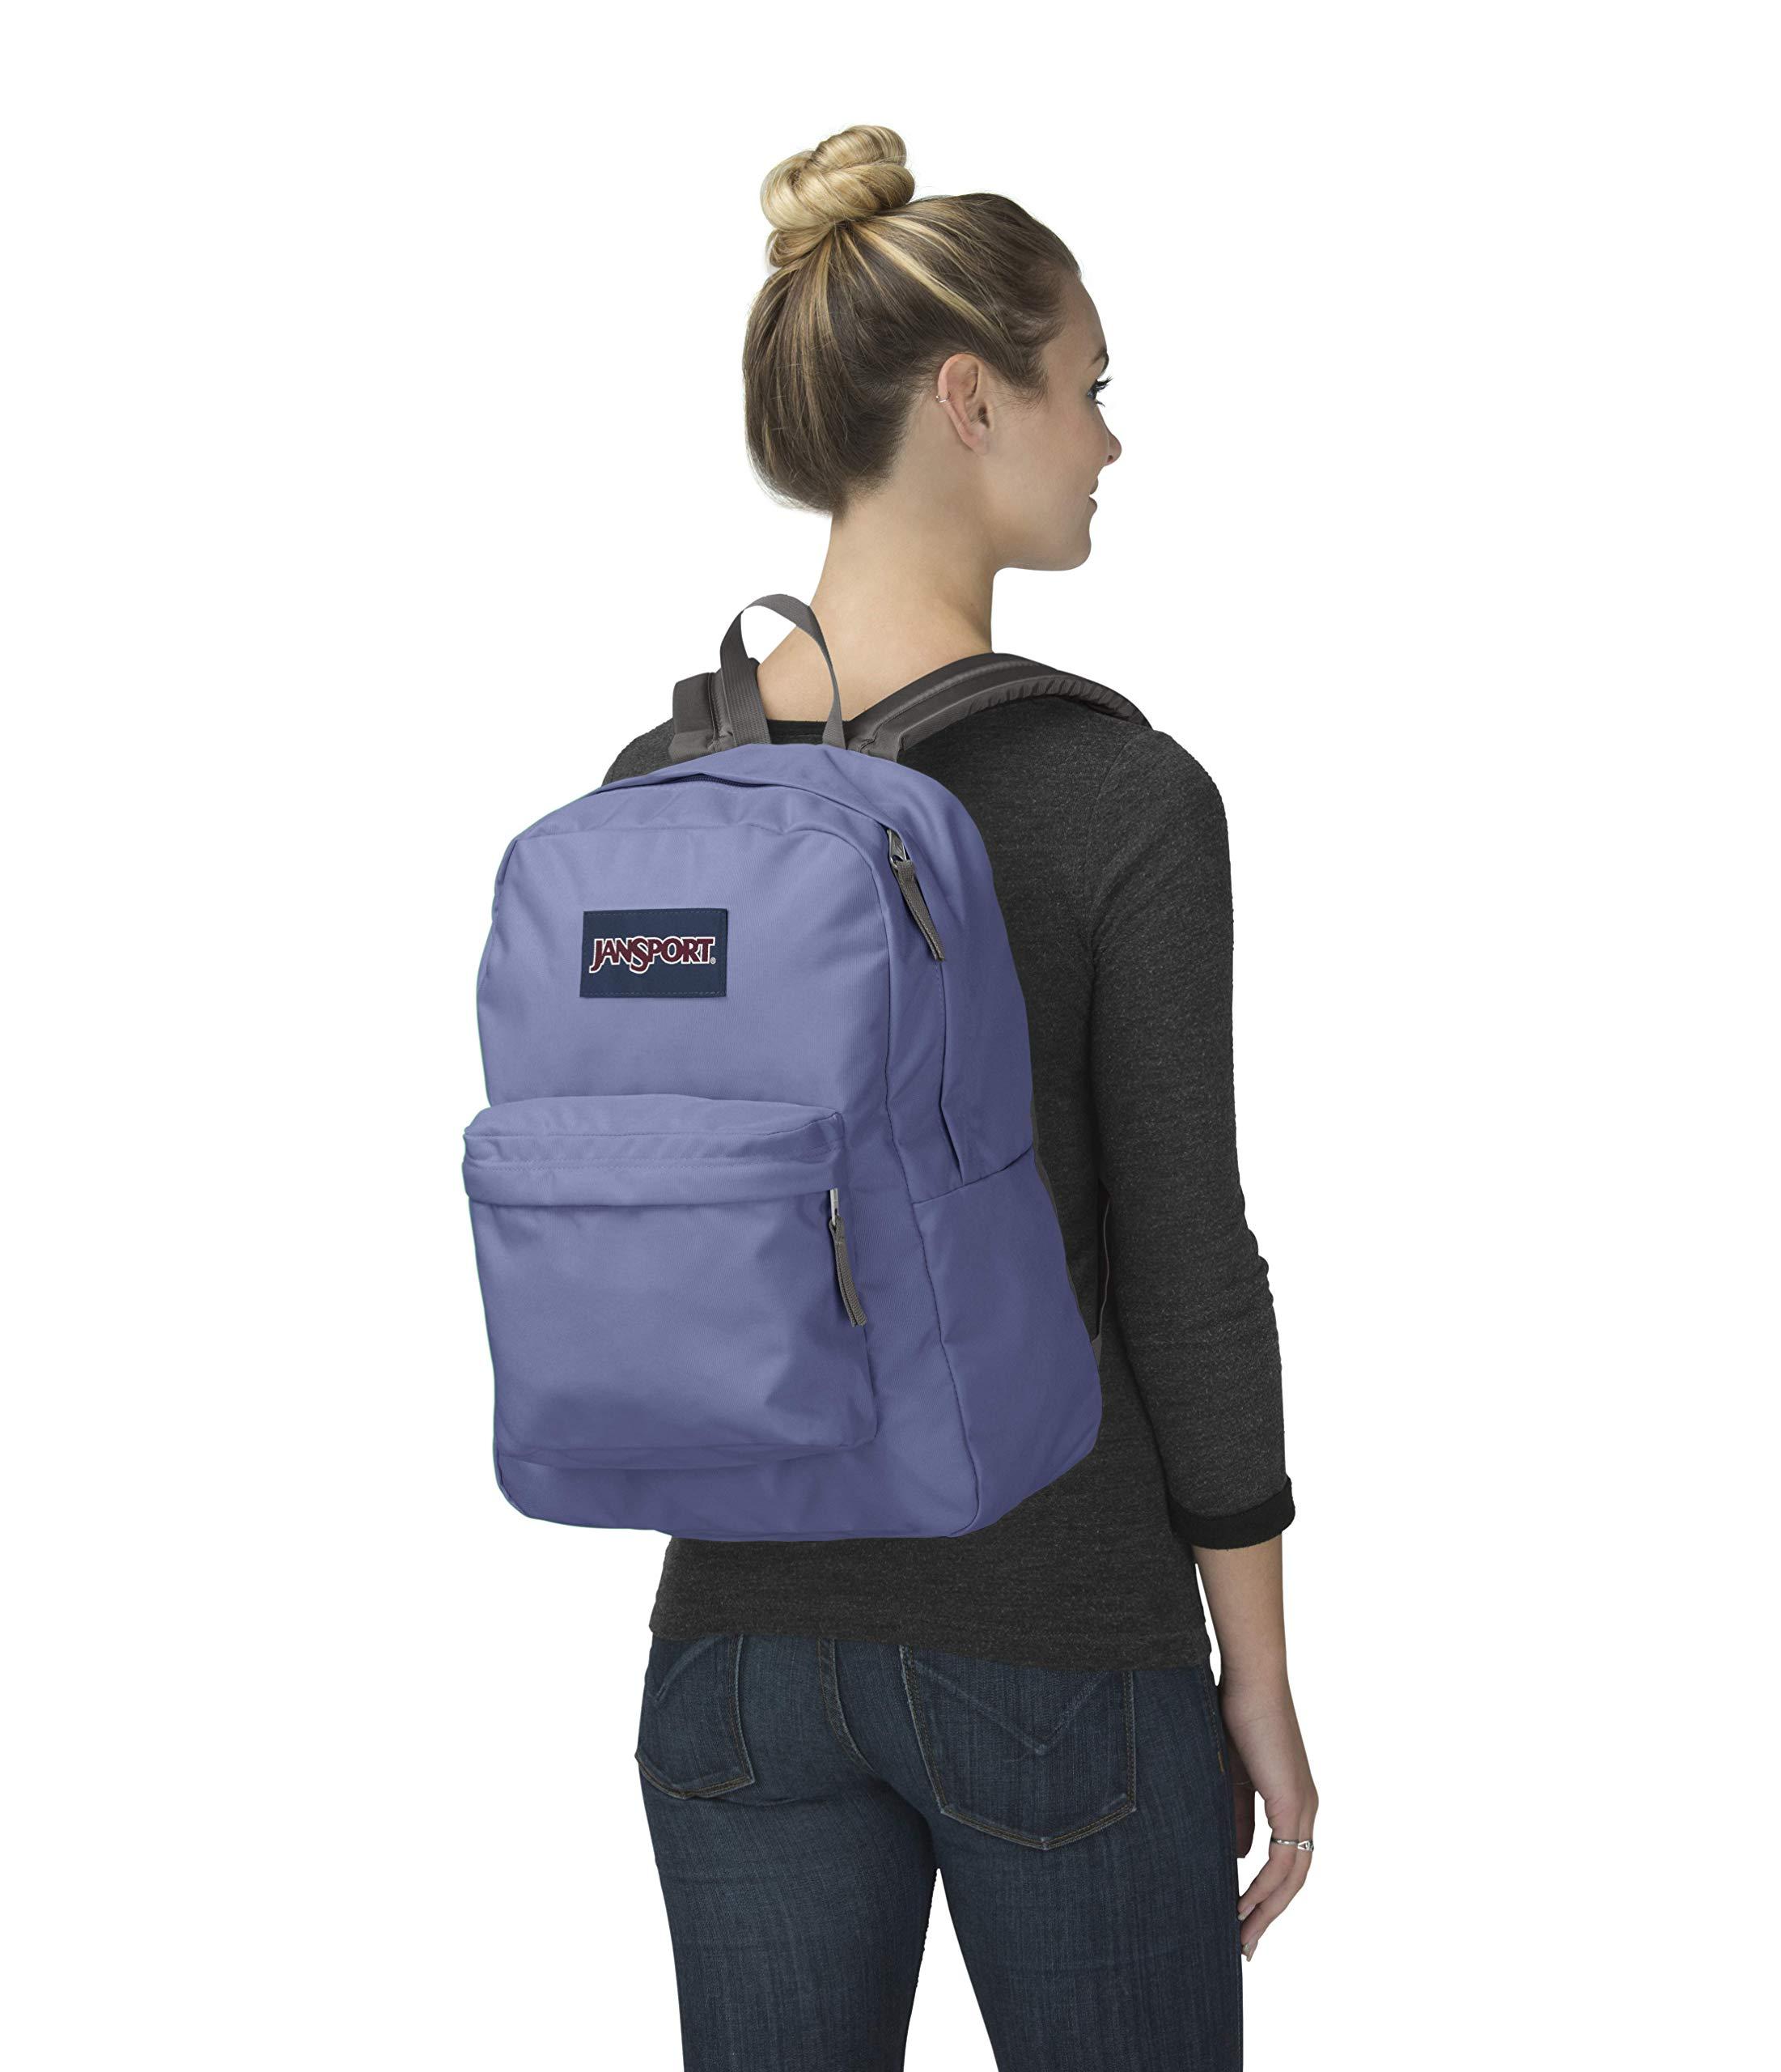 JanSport Superbreak Backpack - Bleached Denim - Classic, Ultralight